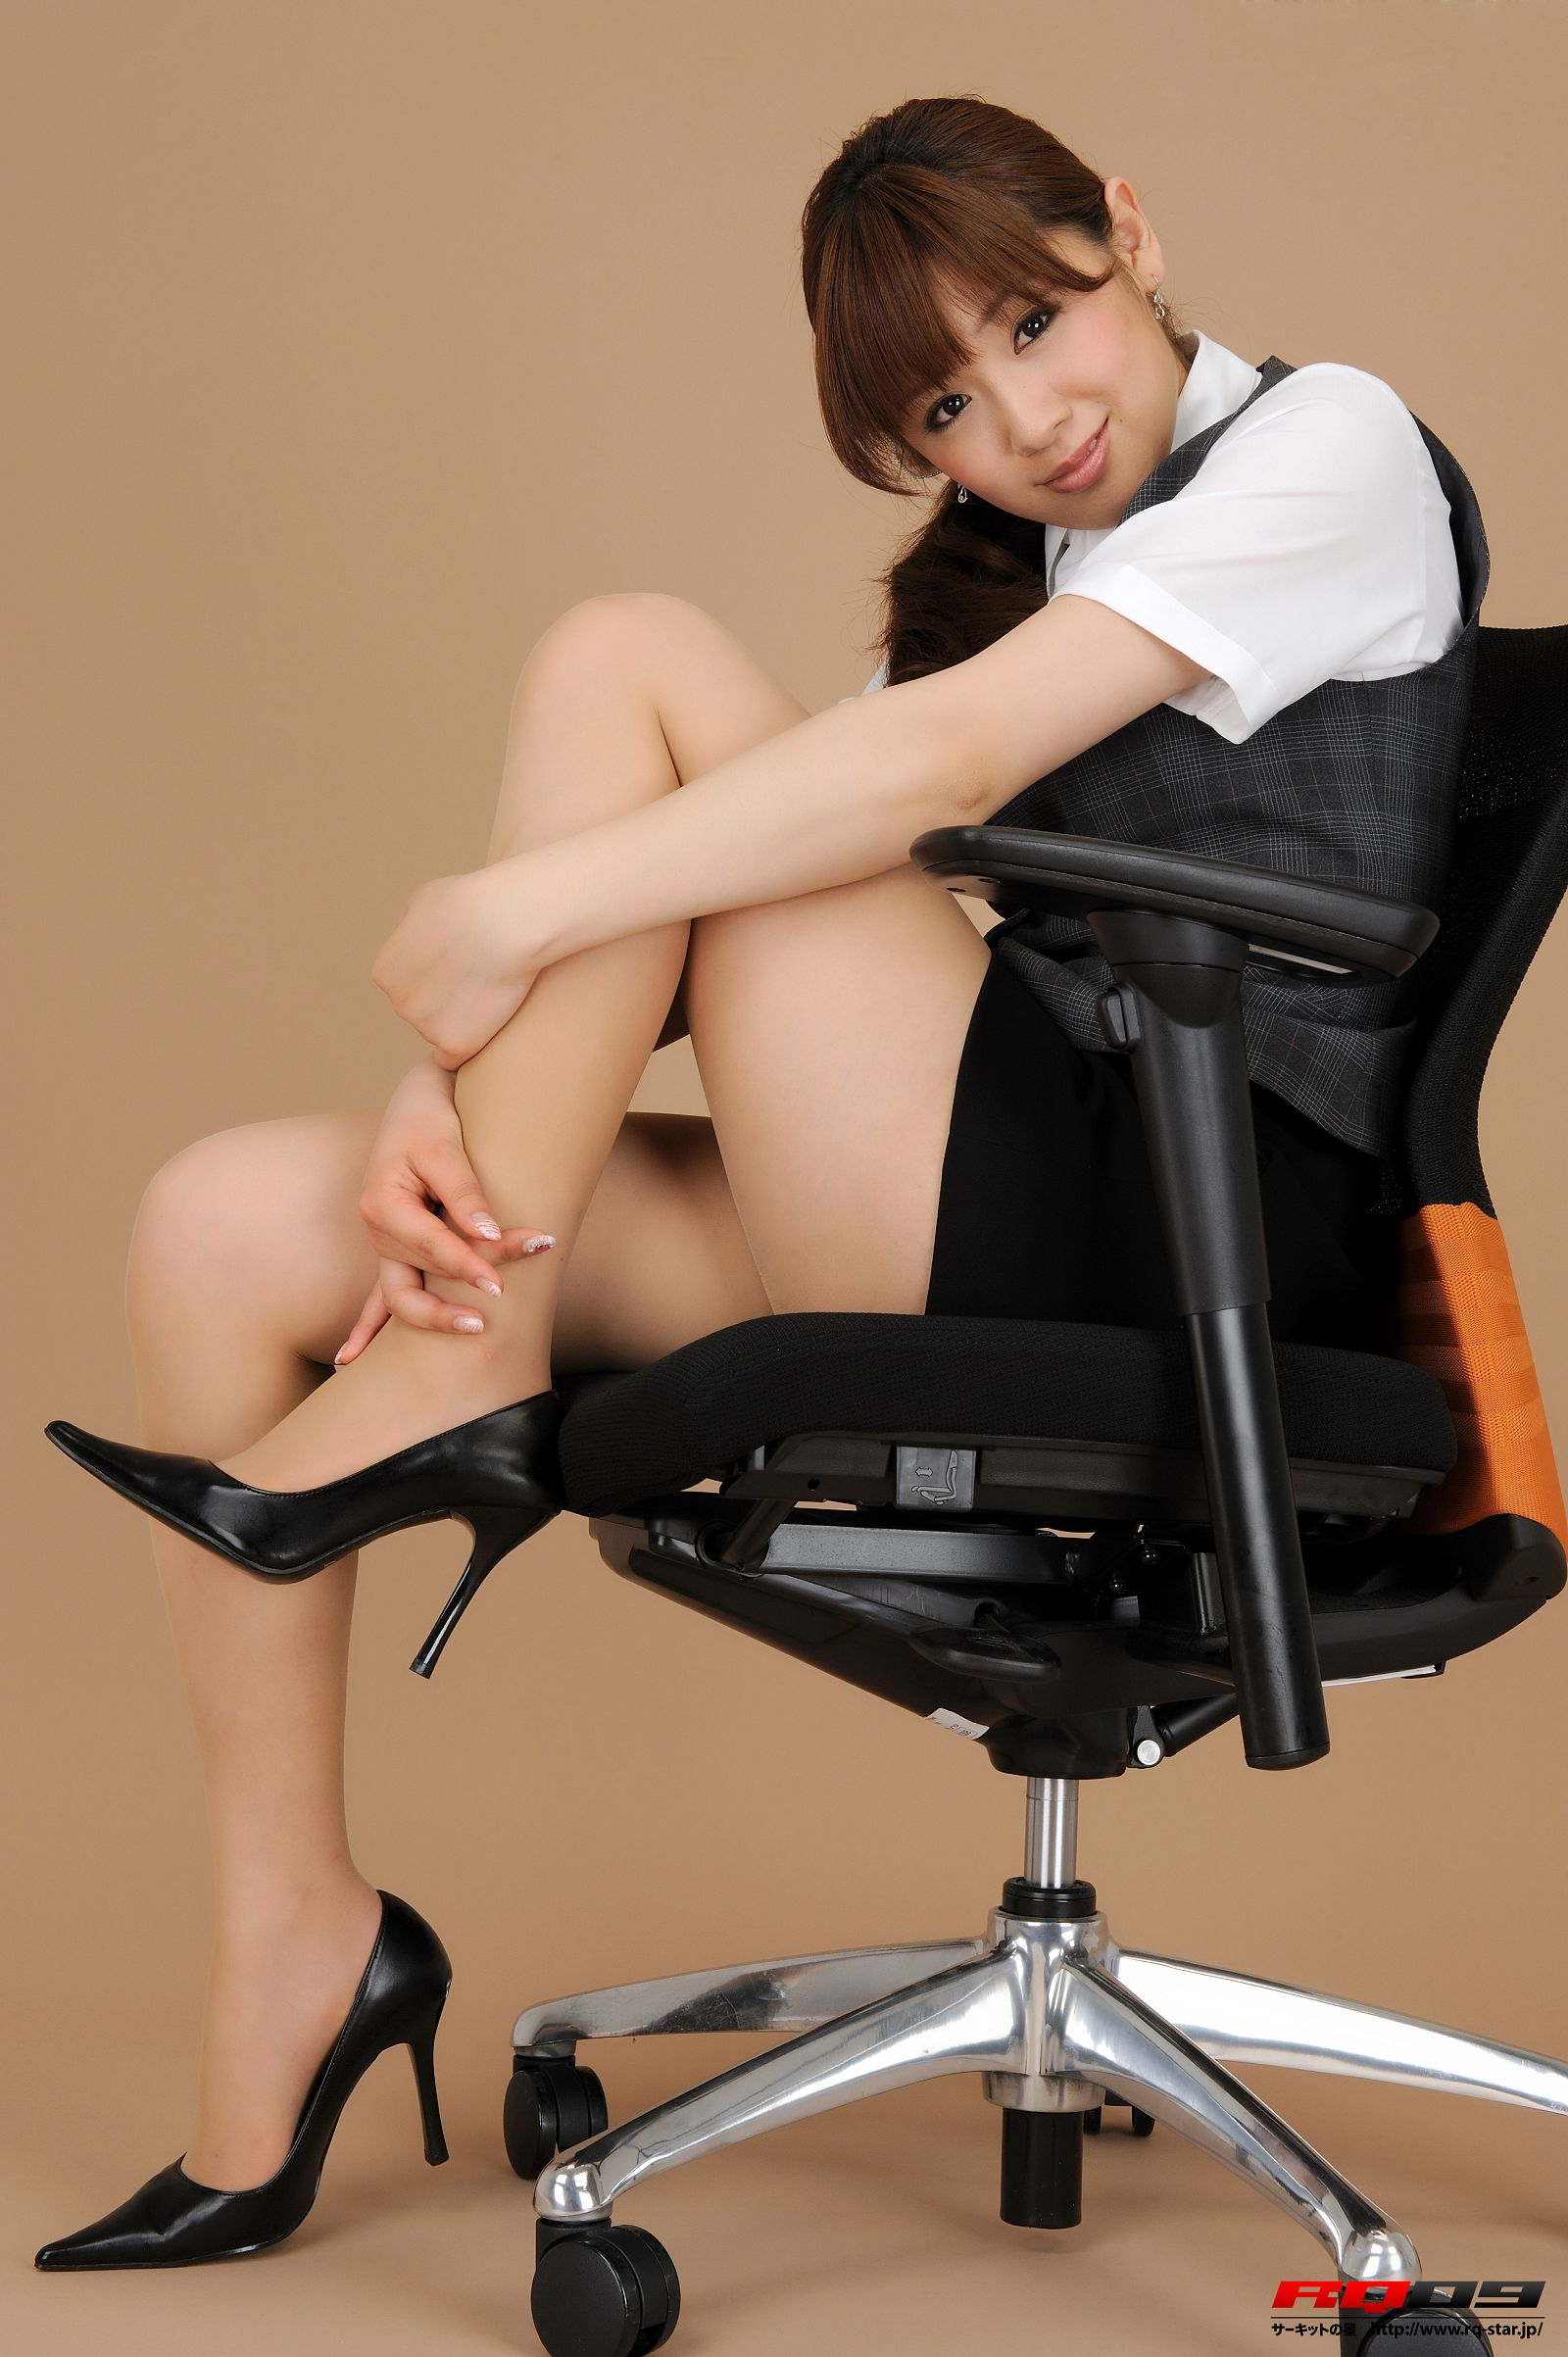 [RQ STAR美女] NO.0179 Chika Tohno 遠野千夏 Office Lady[120P] RQ STAR 第3张